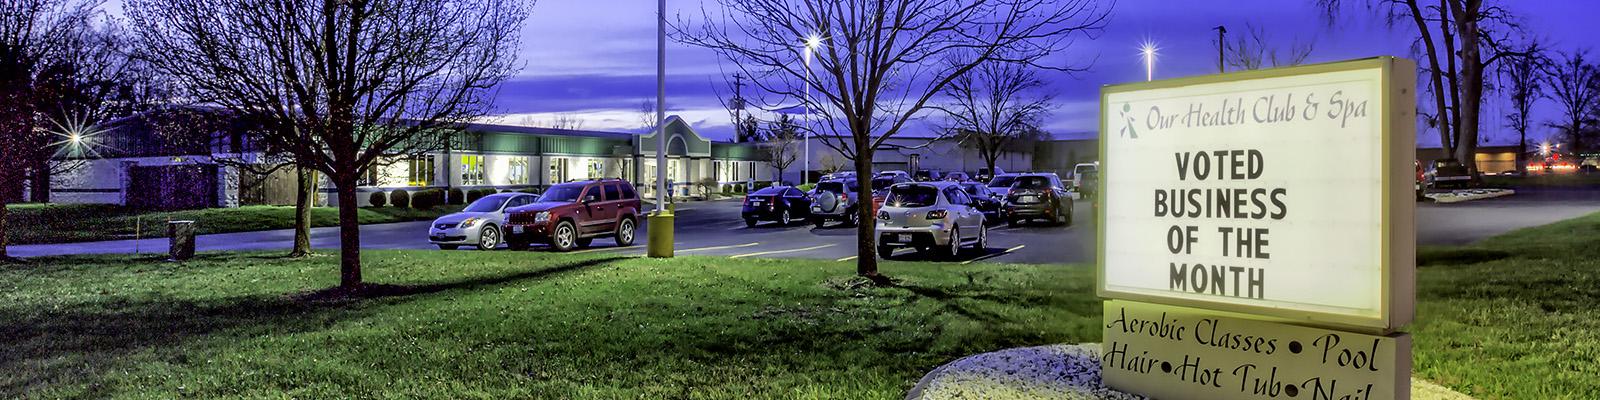 Our Health Club & Spa exterior night scene